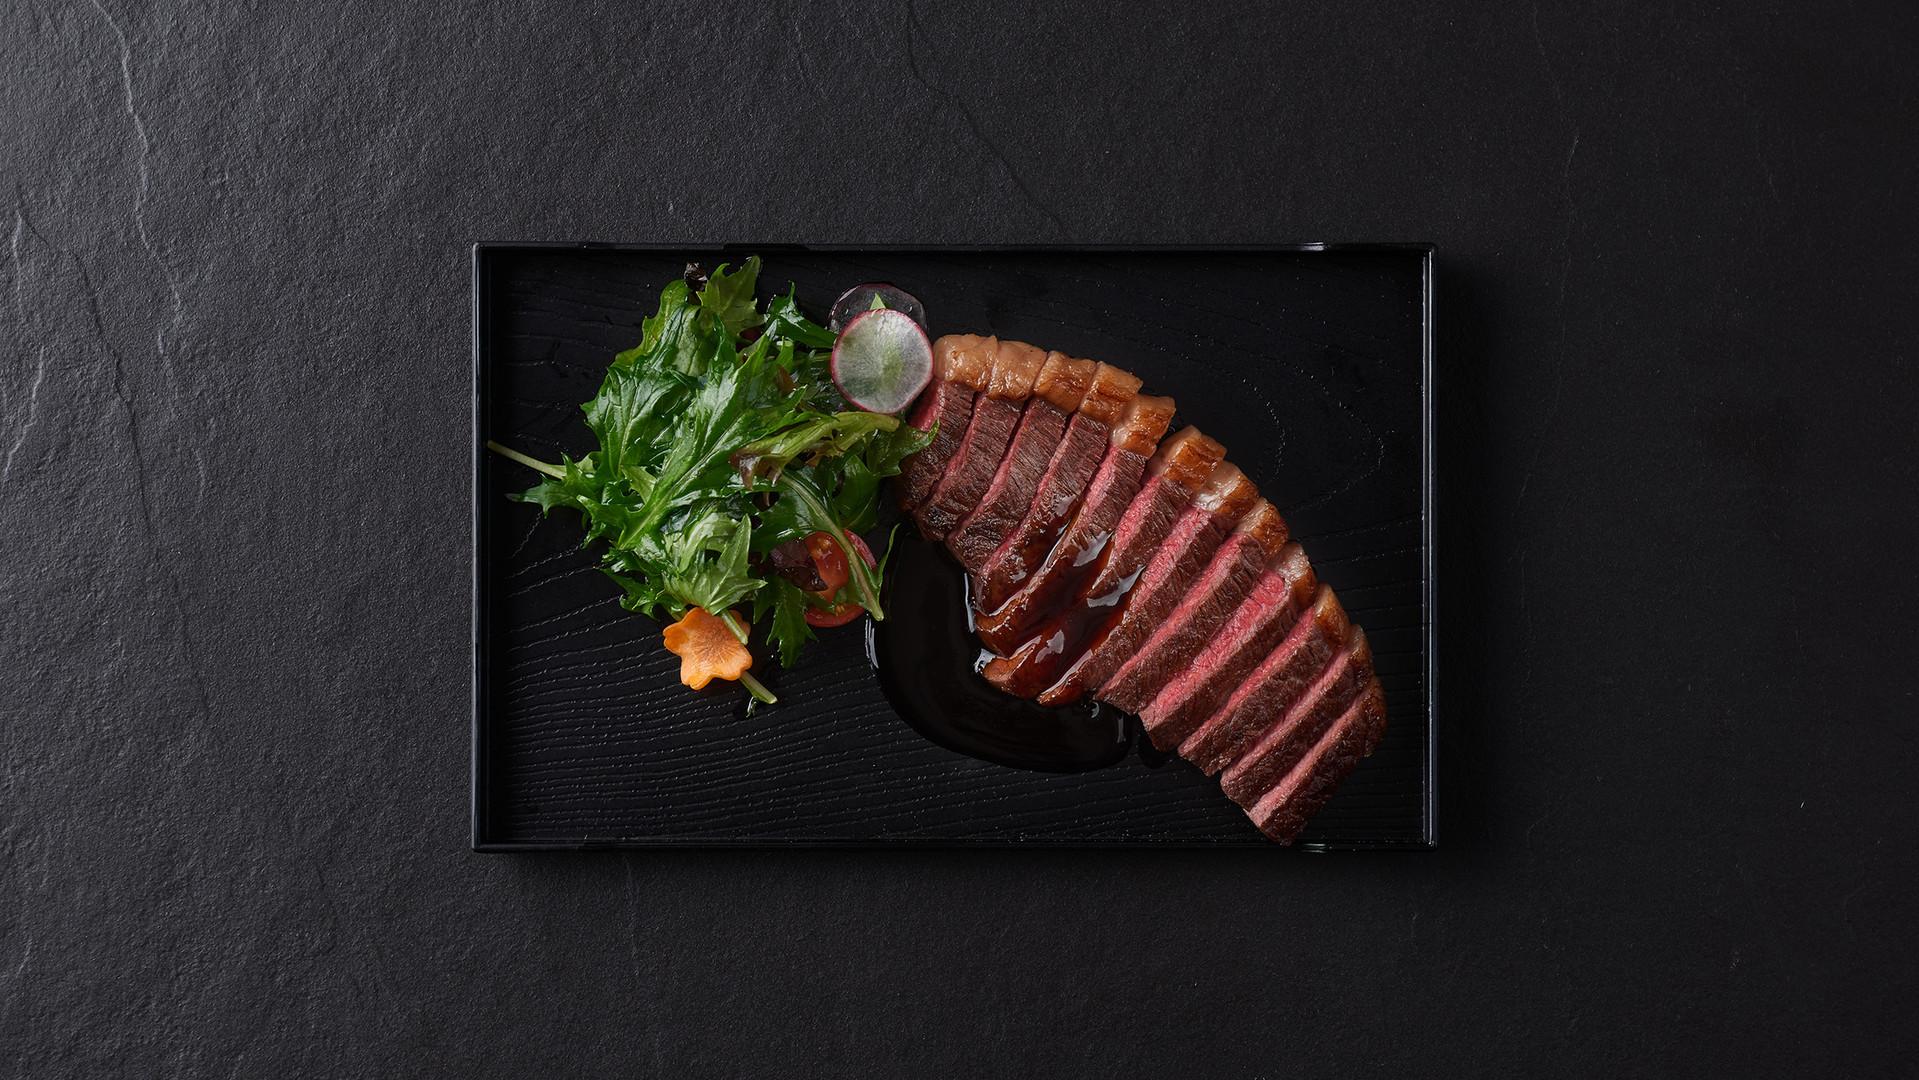 Lifestyle - HSH - Hoshi Wagyu Steak.jpg